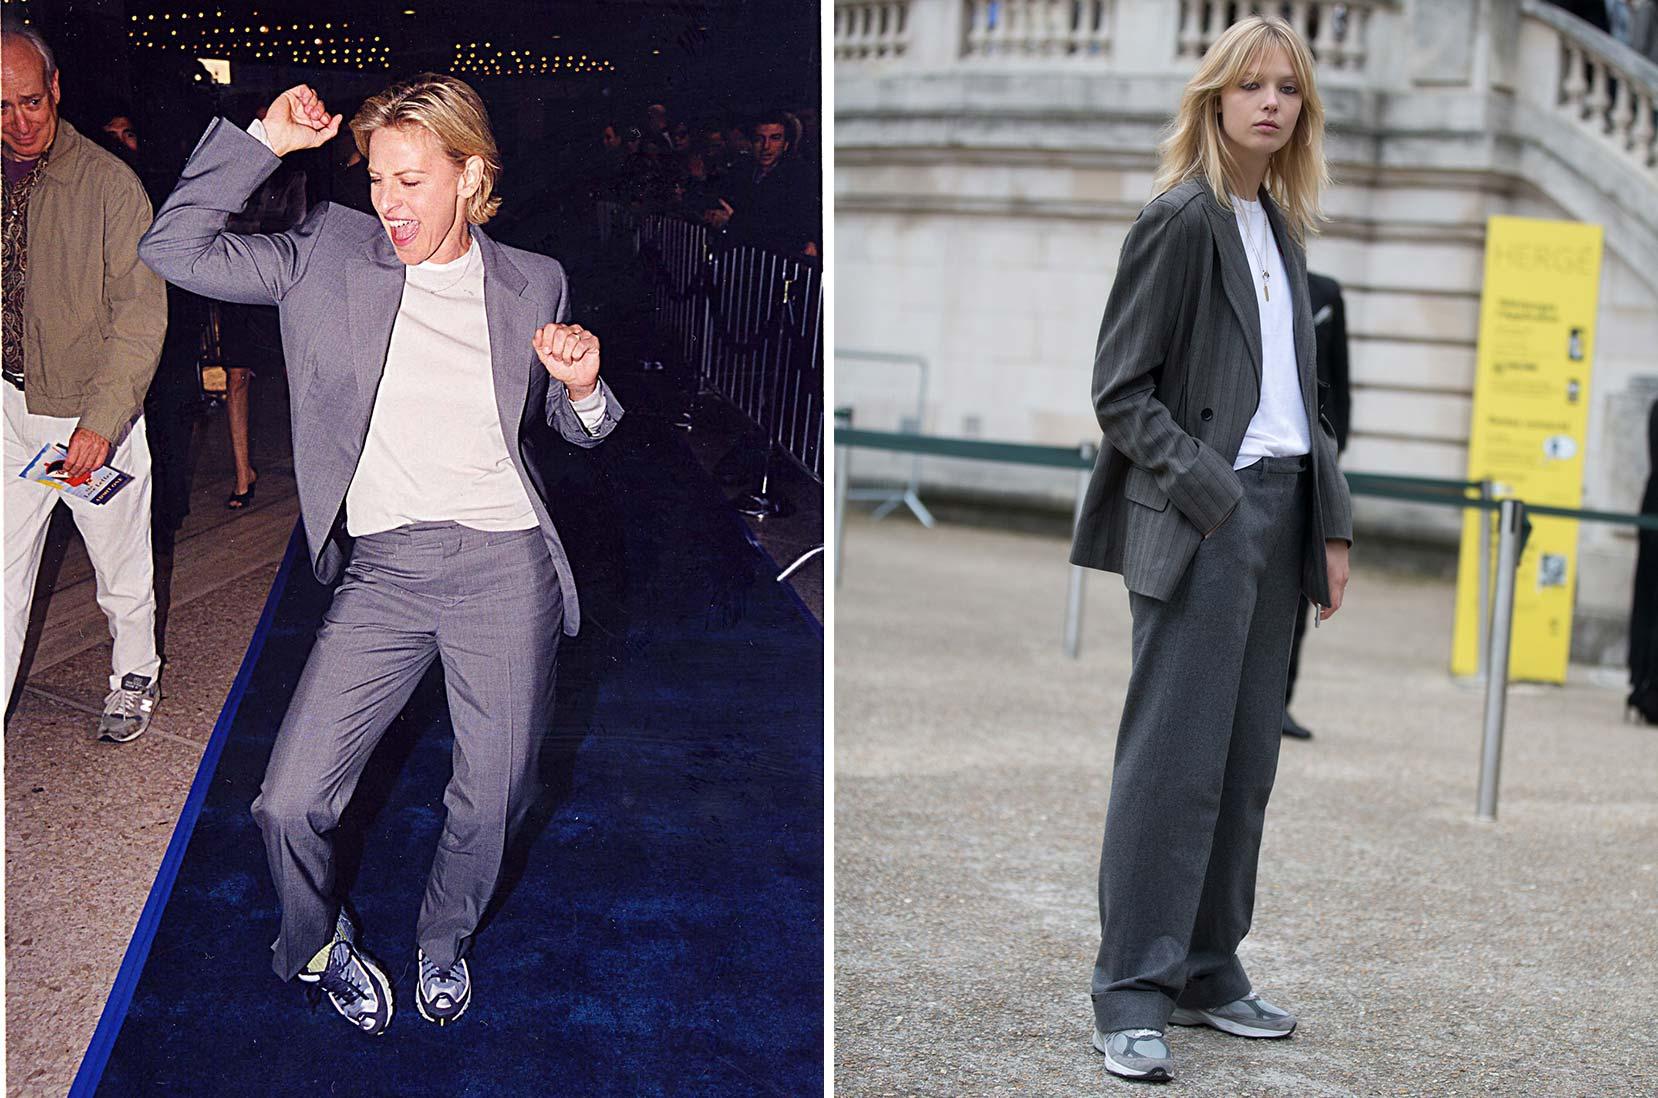 "1) Banbrytande redan 1999: Ellen DeGeneres bär sneakers till sin tvådelade kostym © Jeff Kravitz/FilmMagic, Inc 2) På banan igen 2016: modellen Ulrikke Hoyer med fulsnygga ""dad sneakers"" till kostymen © Melodie Jeng/Getty Images"